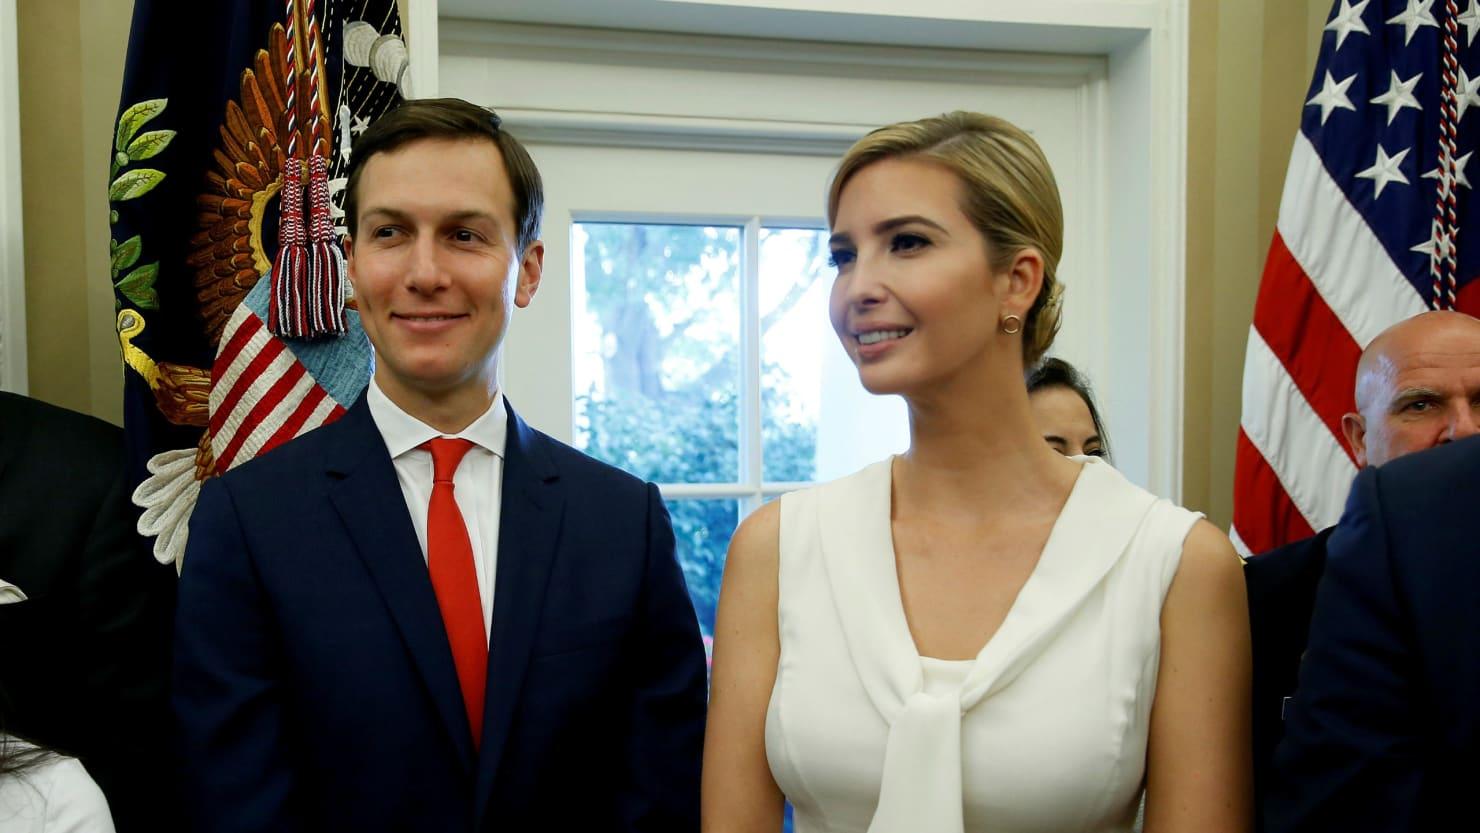 Ivanka Trump and Jared Kushner Commercial Income